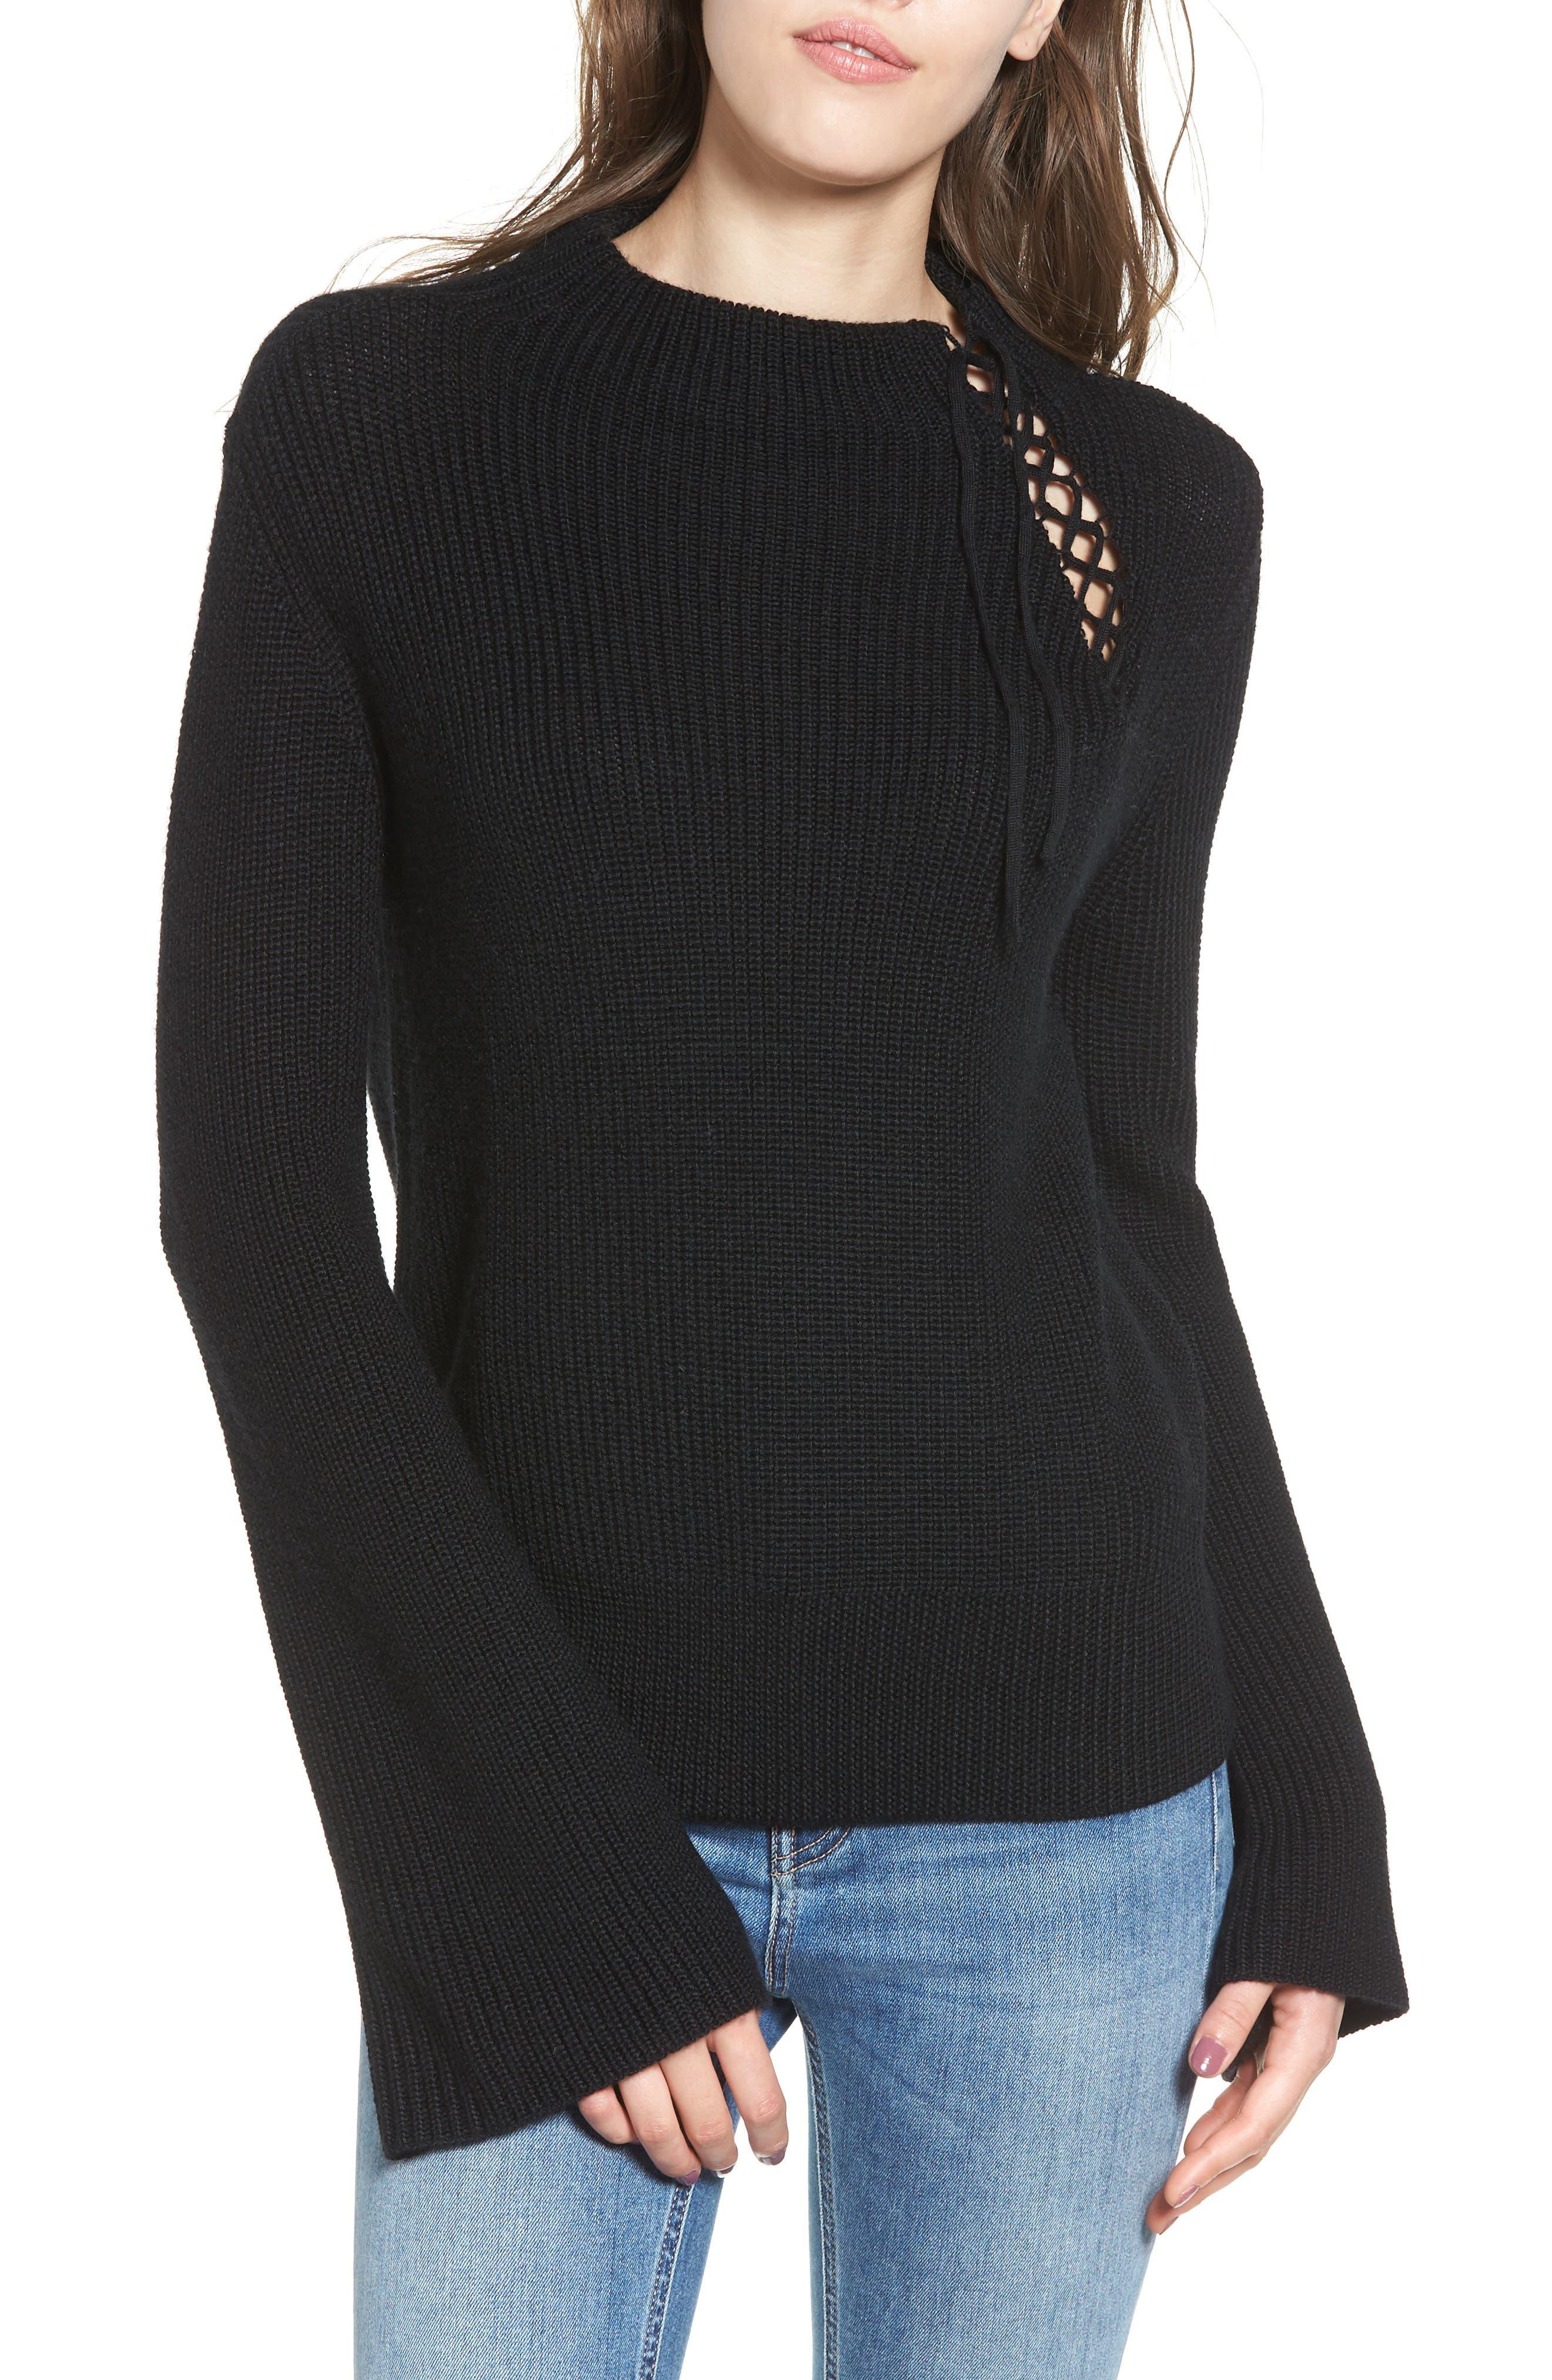 Alternate Image 1 Selected - Ella Moss Gracey Mock Neck Sweater